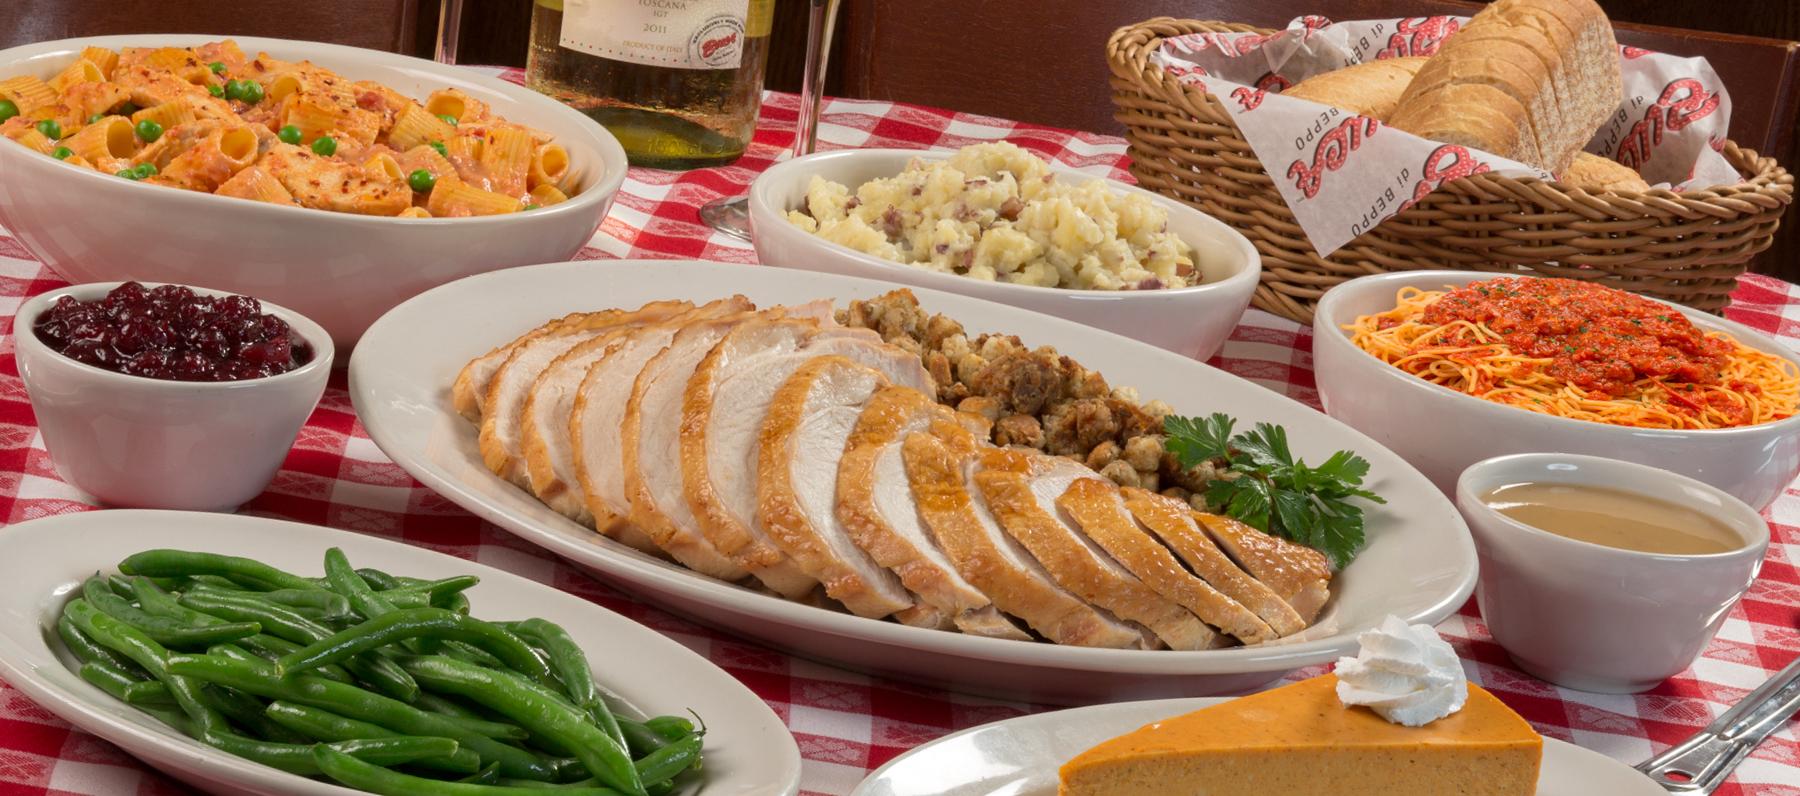 #BucadiBeppo #Thanksgiving #ad